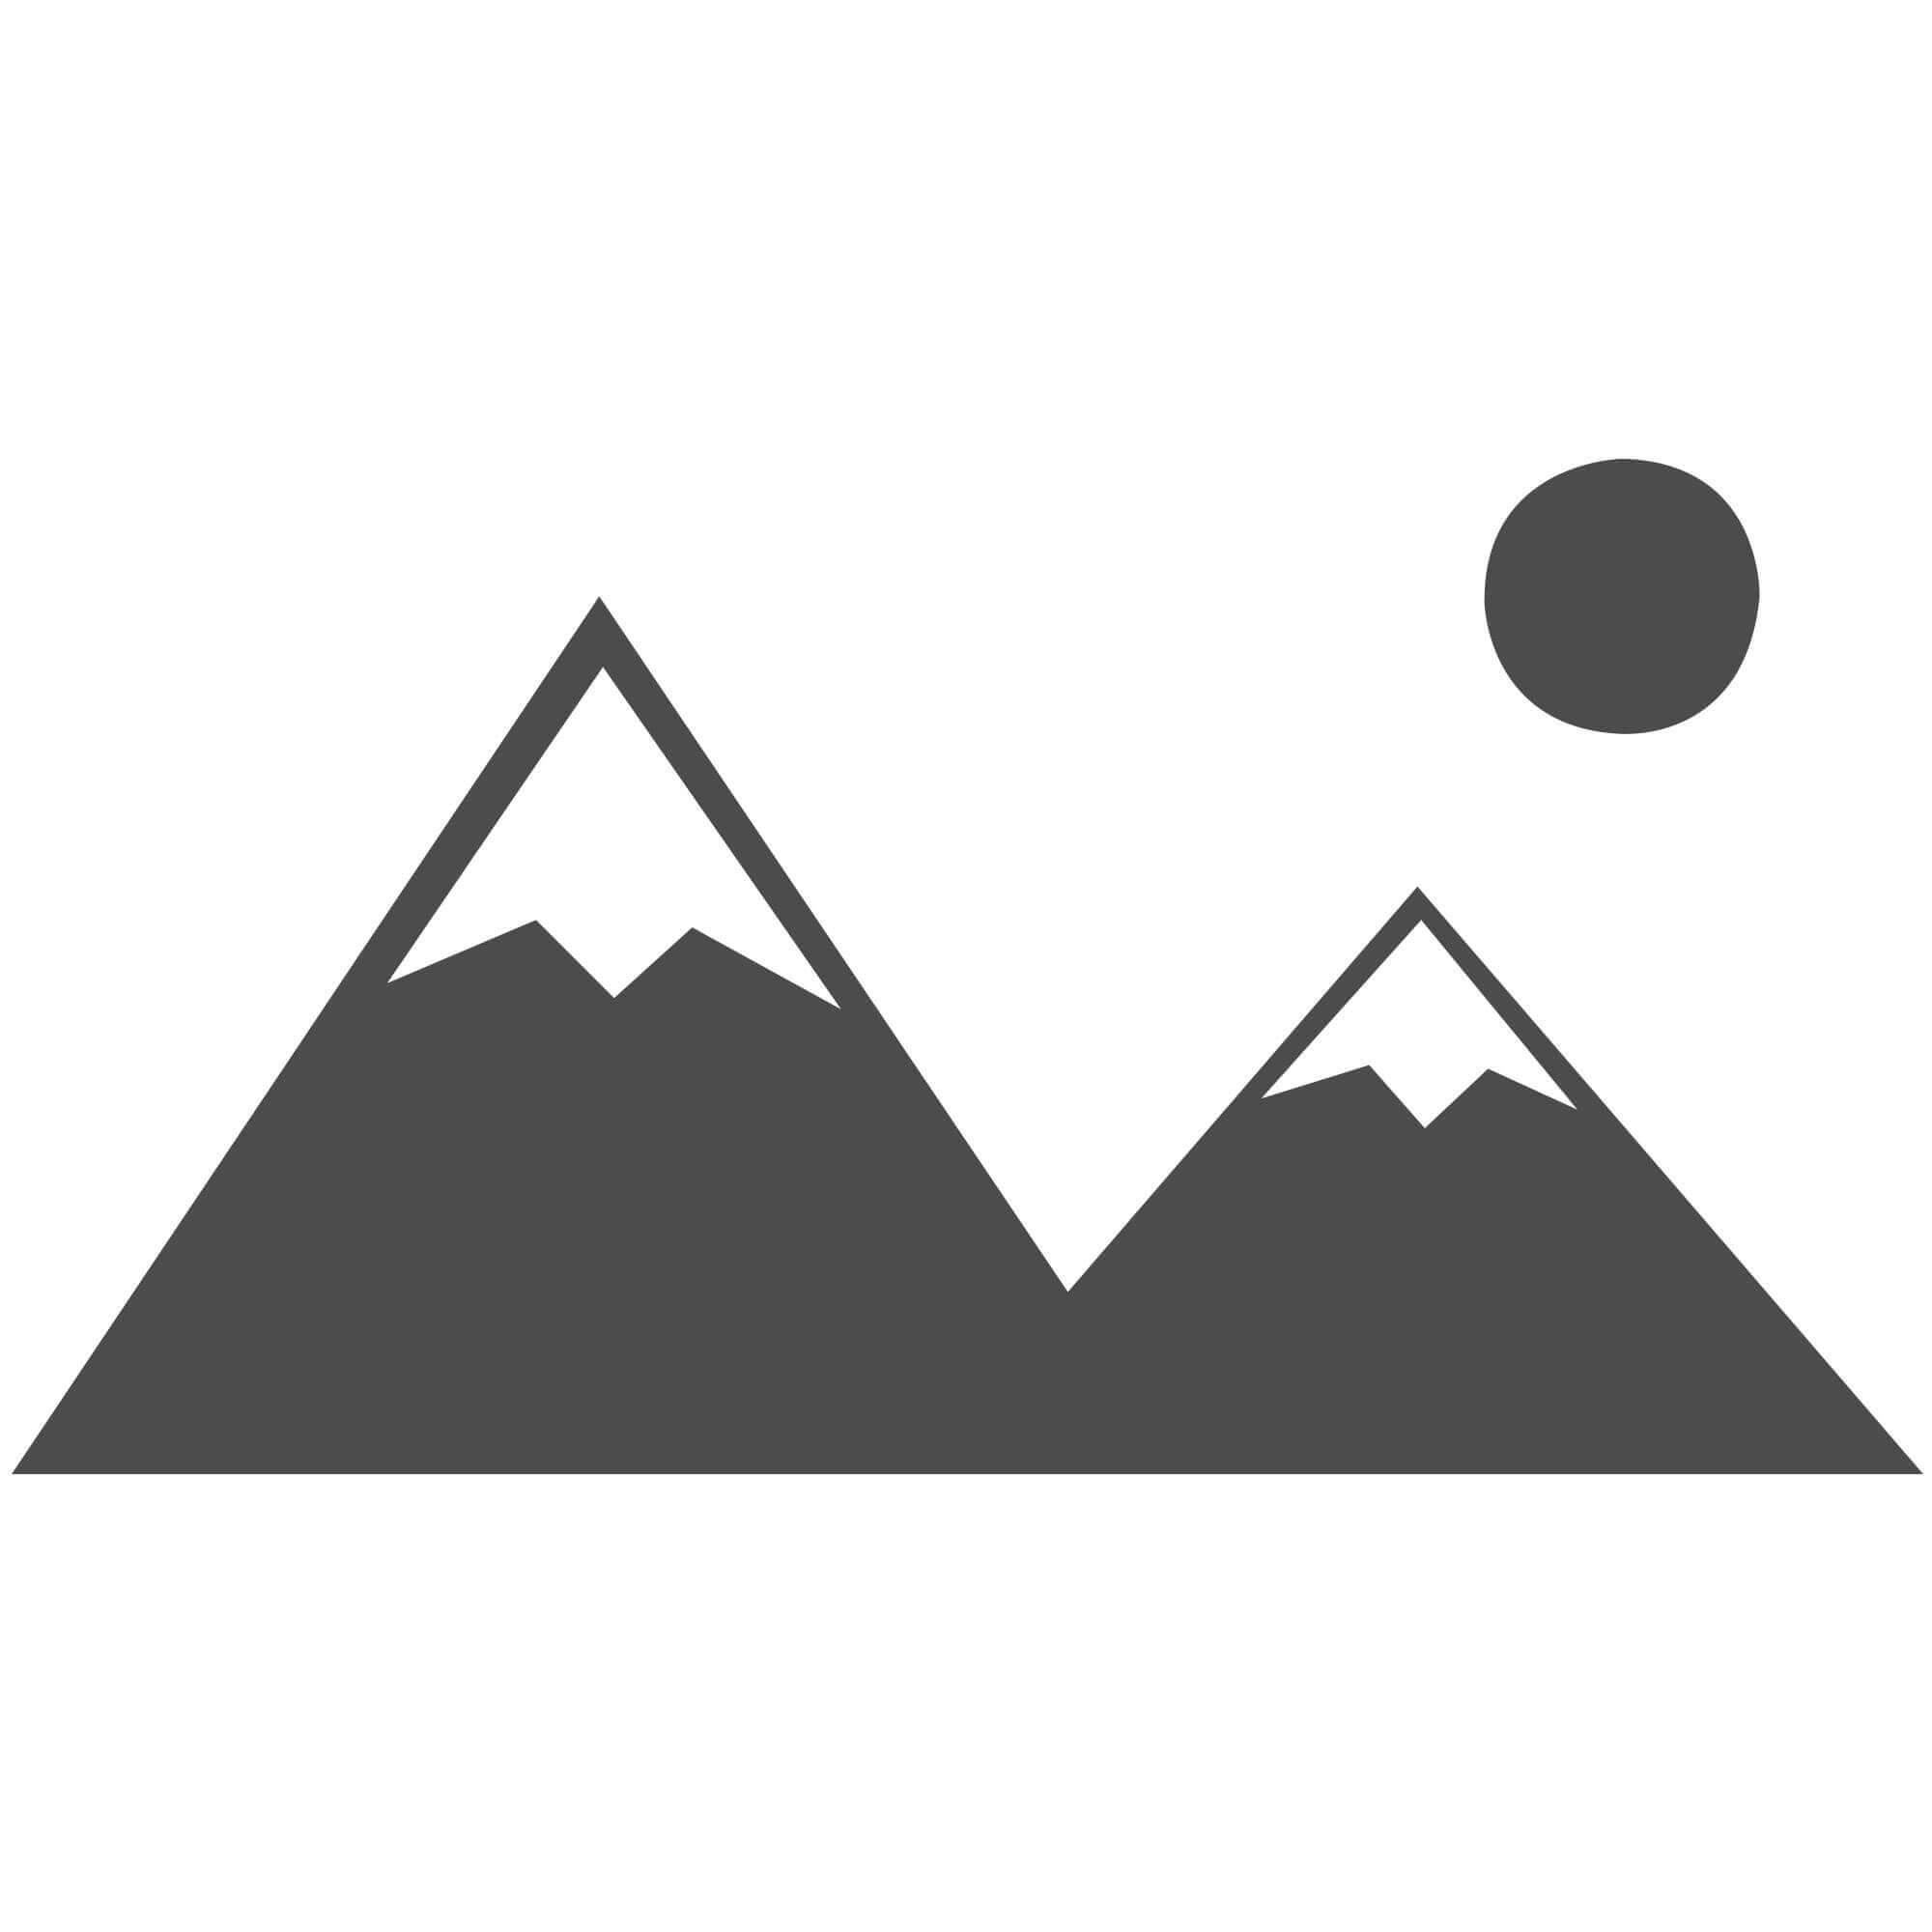 British Sheepskin Rug  - Cornish Cream-Treble Skin